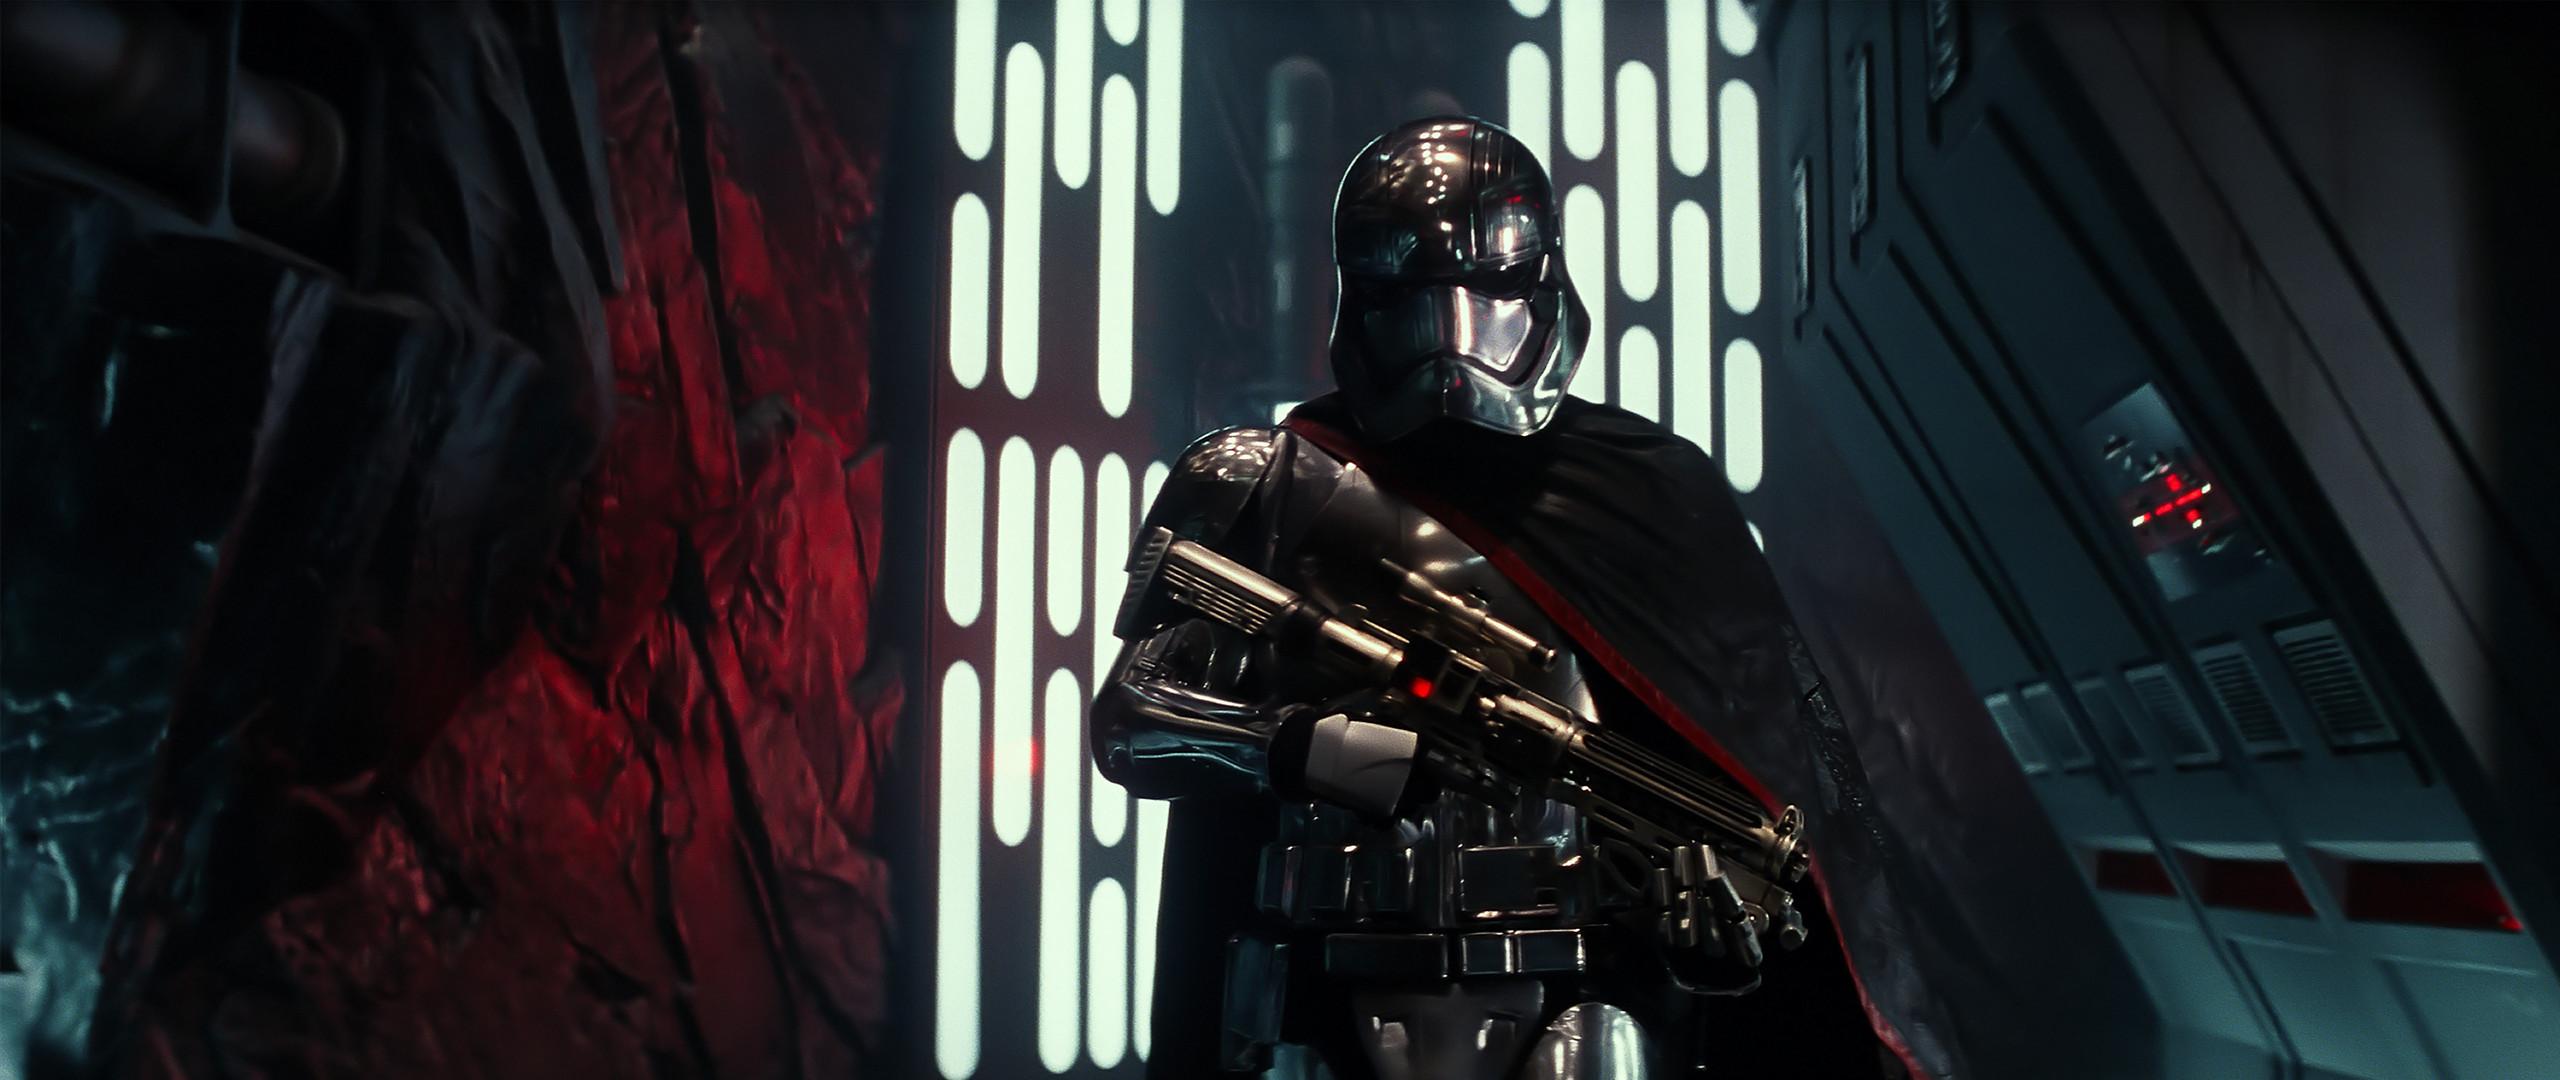 General Star Wars: The Force Awakens Captain Phasma Star Wars